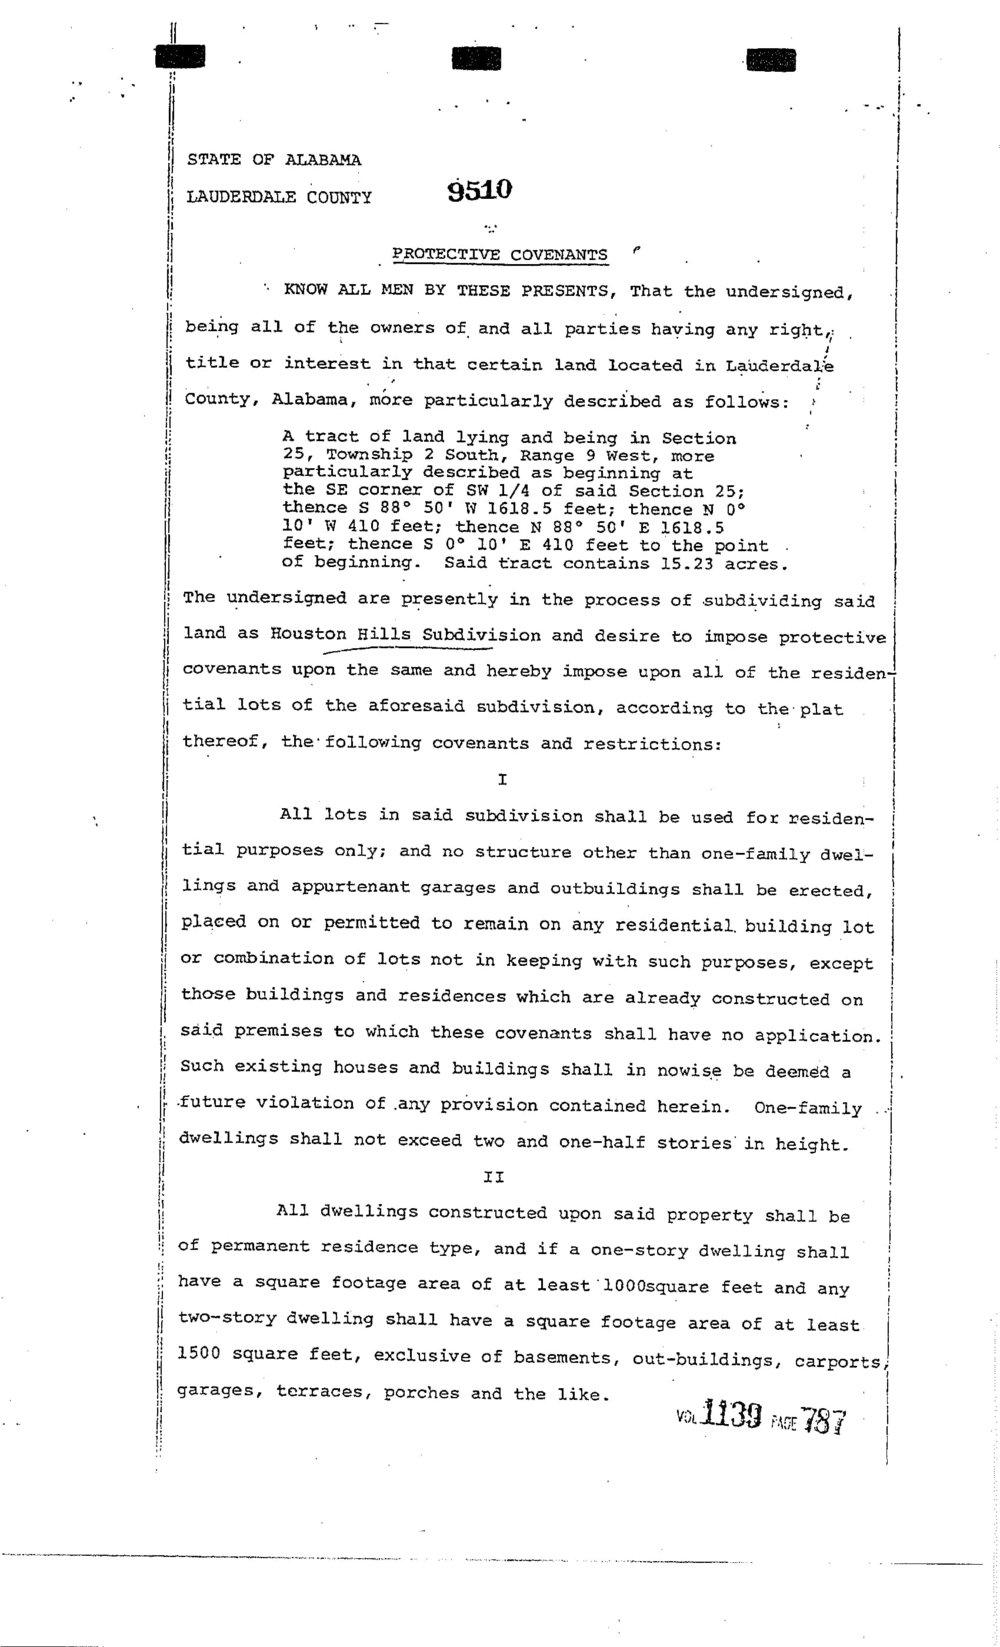 Covenants-Houston-Hills-Subdivsion-1.jpg